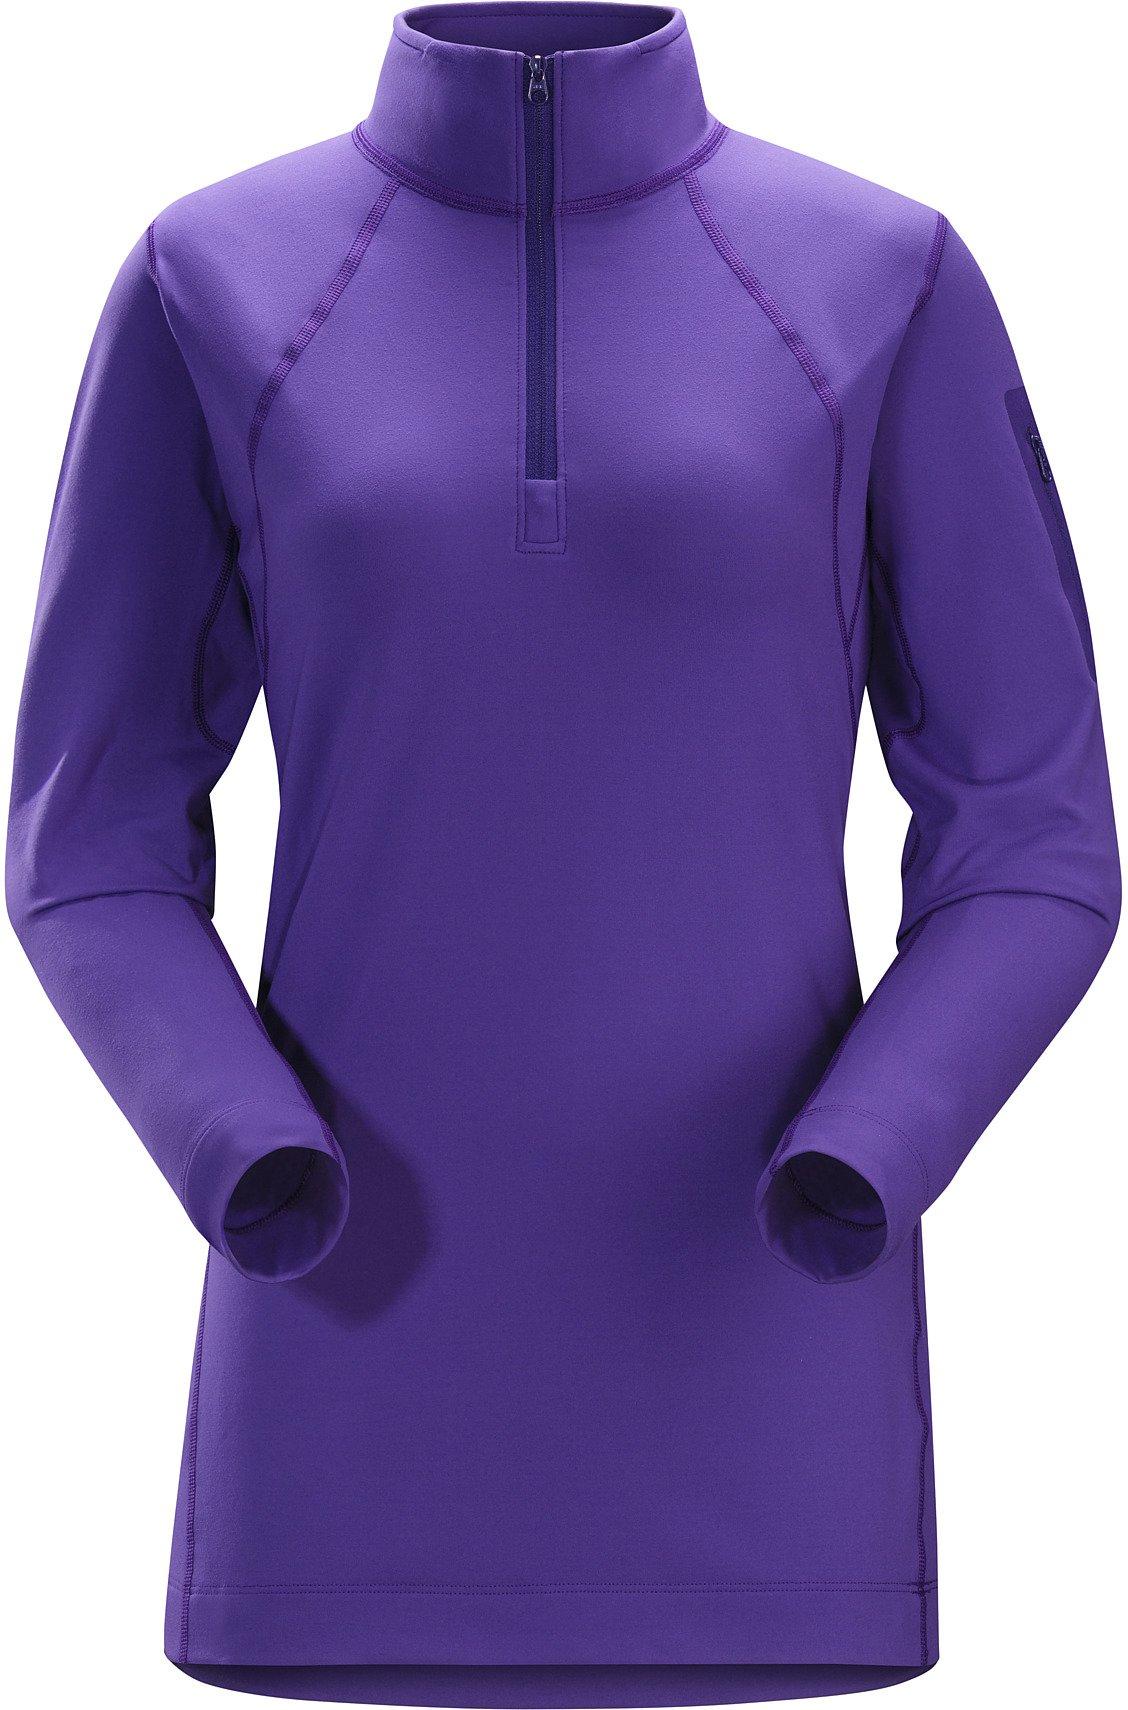 Arc'teryx Women's Rho LT Zip Neck Dahlia Shirt